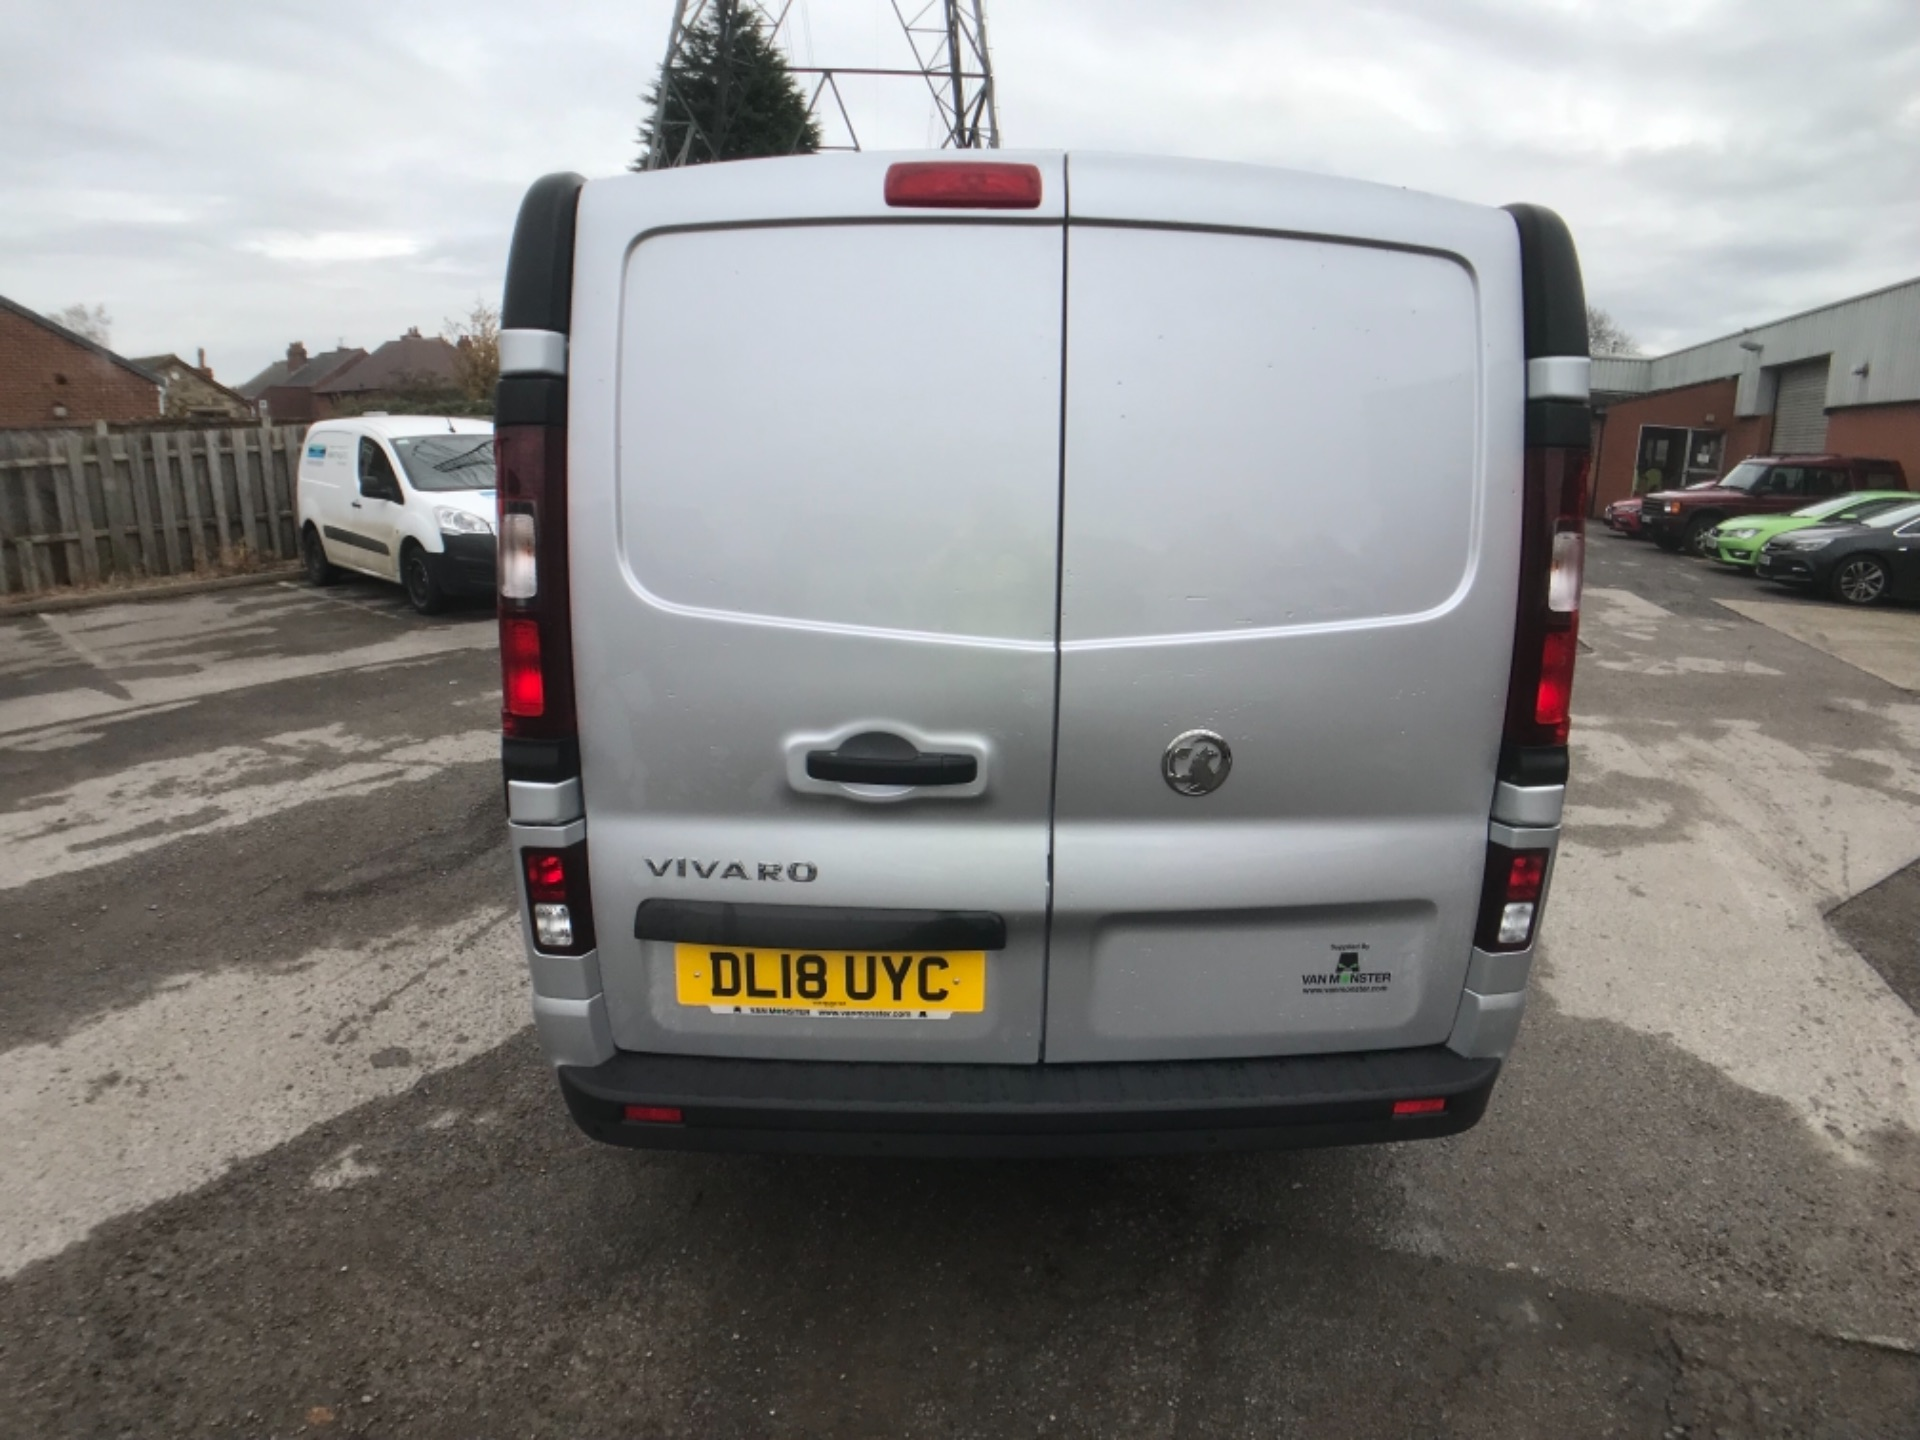 2018 Vauxhall Vivaro L2 H1 2900 1.6CDTI 120PS SPORTIVE EURO 6 (DL18UYC) Image 6